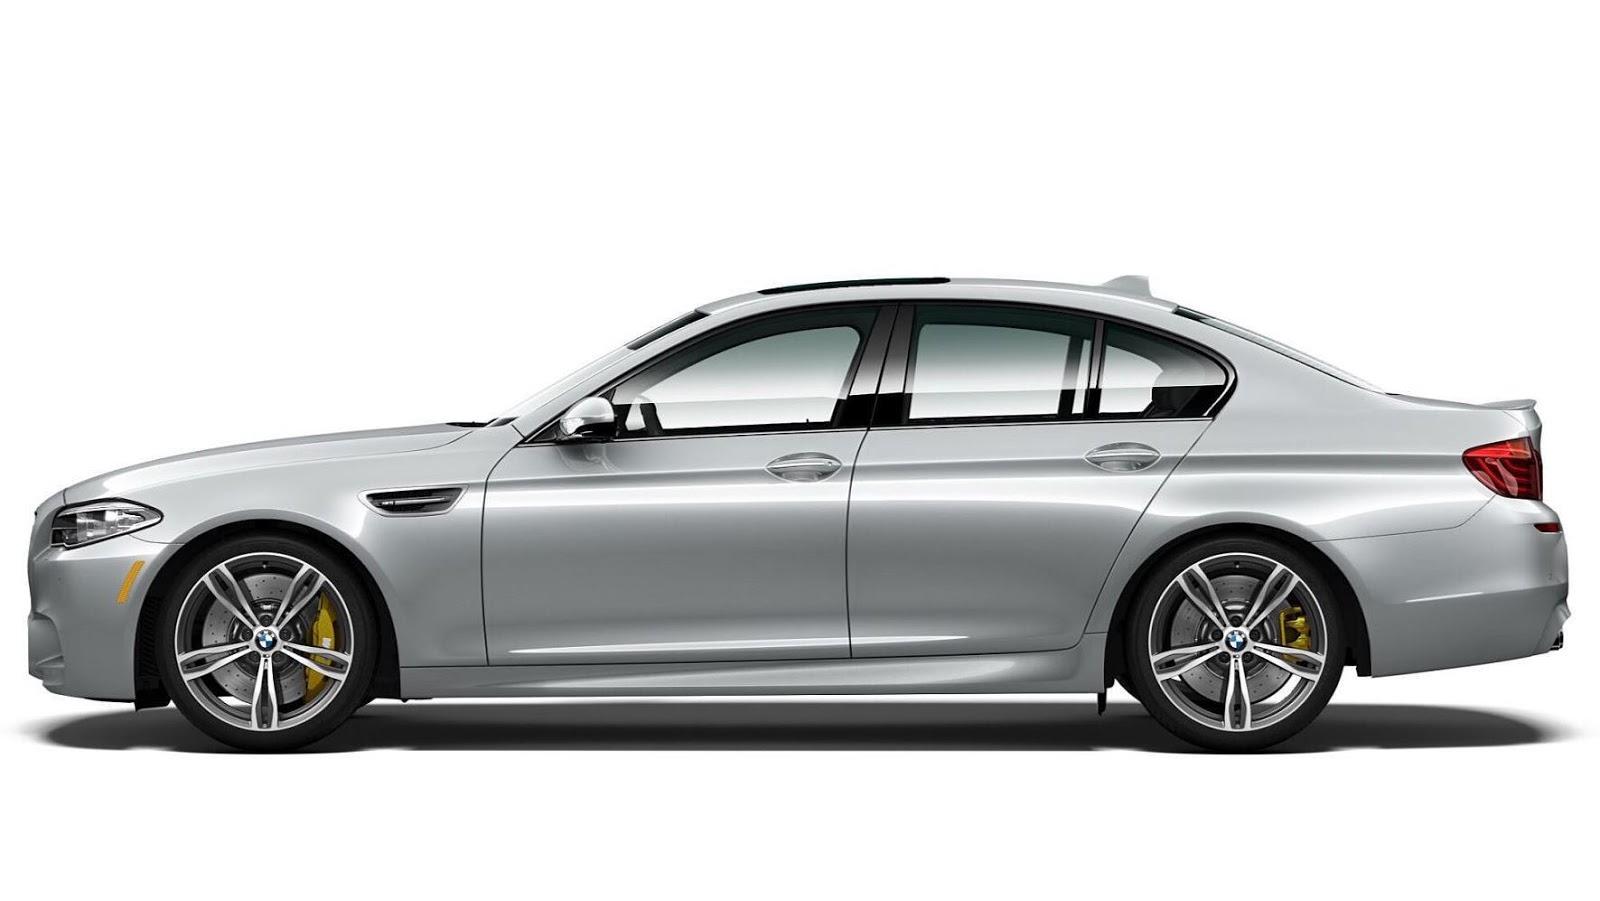 Ra mắt BMW M5 Pure Metal Silver bản giới hạn - 4